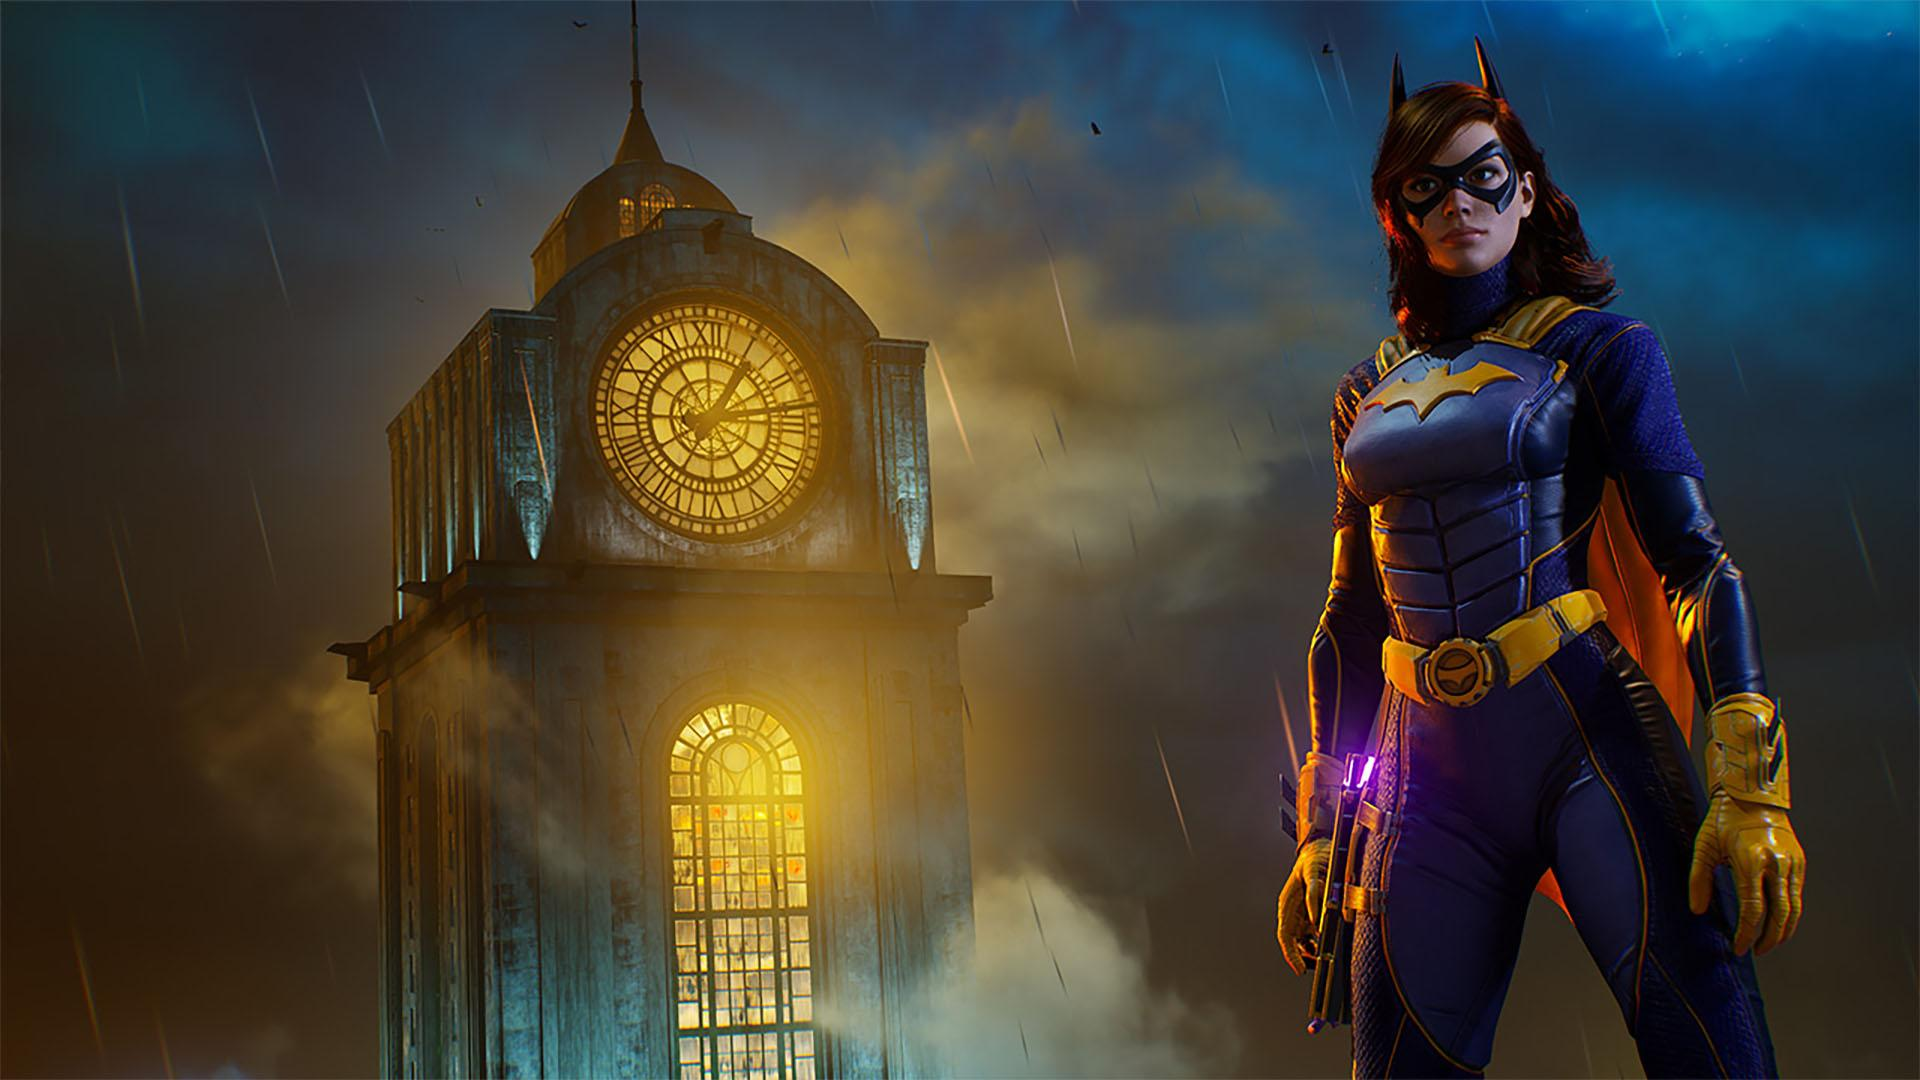 Gotham Knights Proposera Une Histoire Complètement Originale